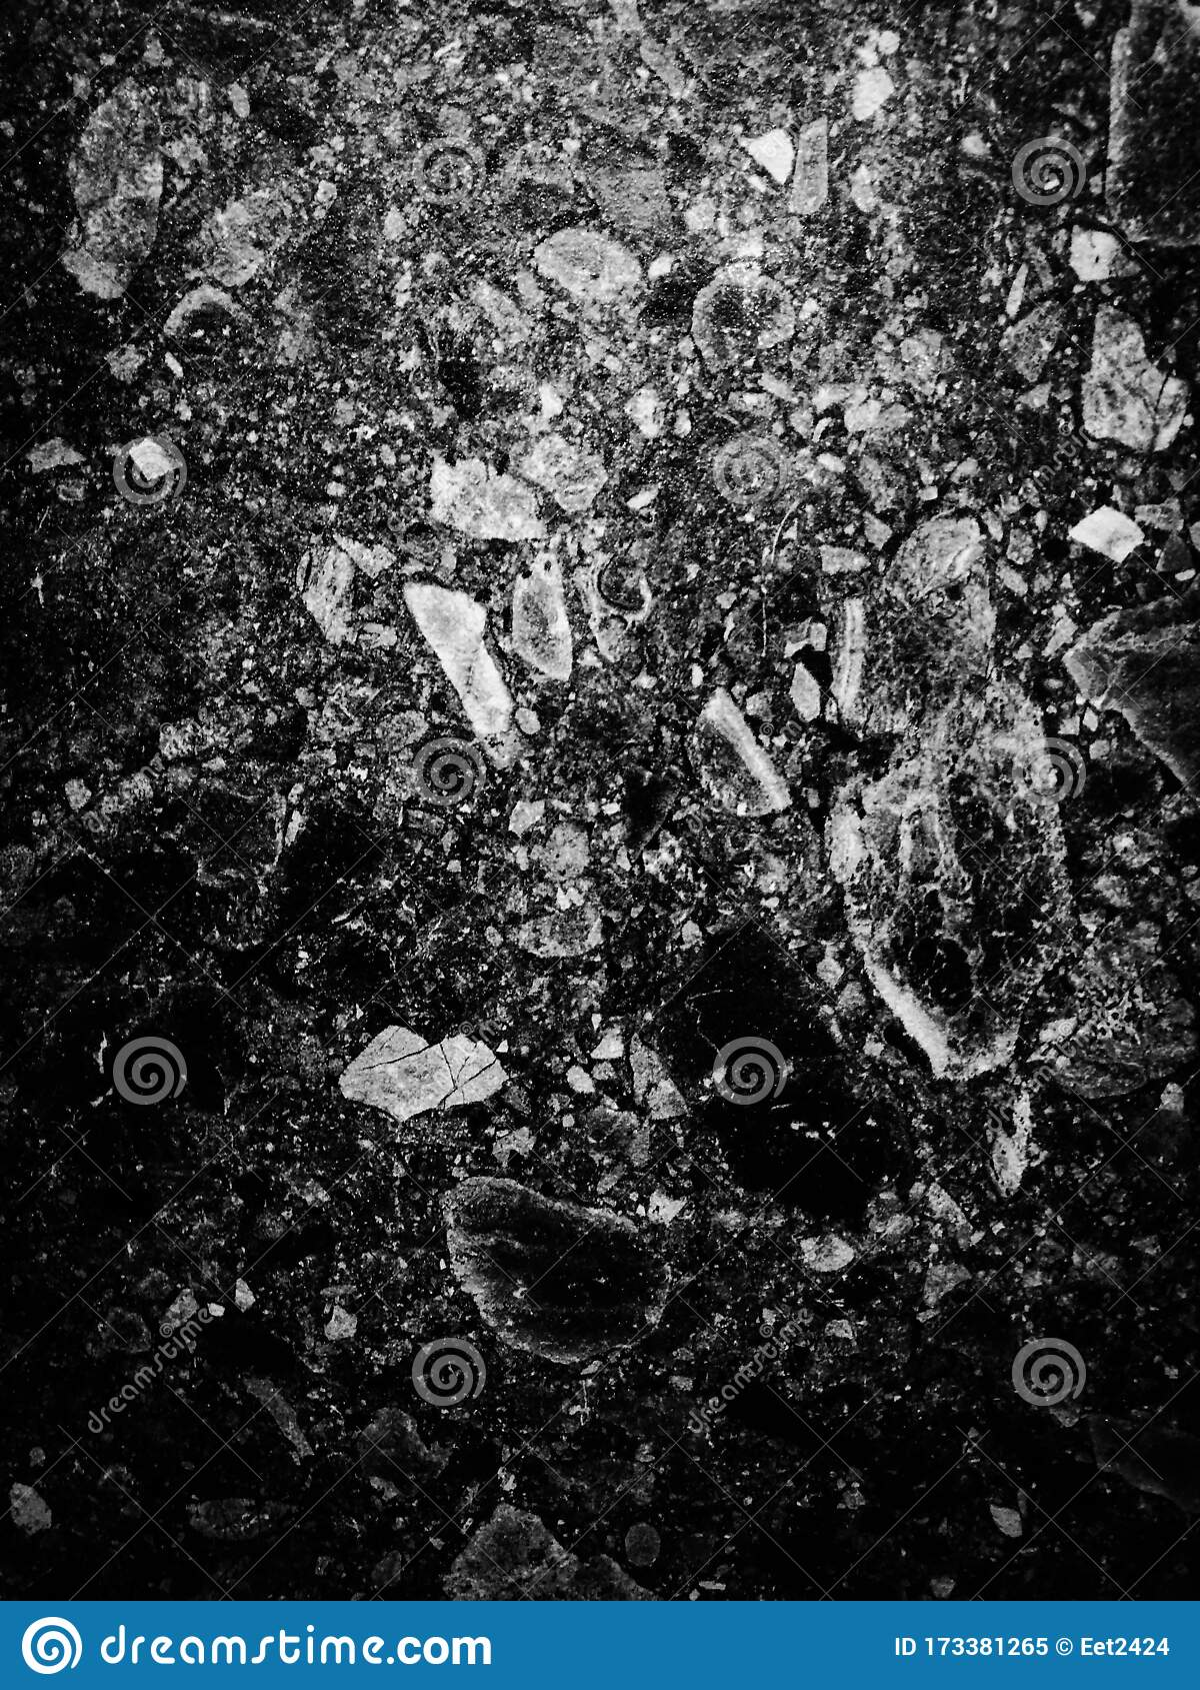 Beautiful Closeup Textures Abstract Color Dark Black And White Granite Tiles Floor And Black Flowers Granite Rock Wall Pattern W Stock Image Image Of Ceramic Closeup 173381265